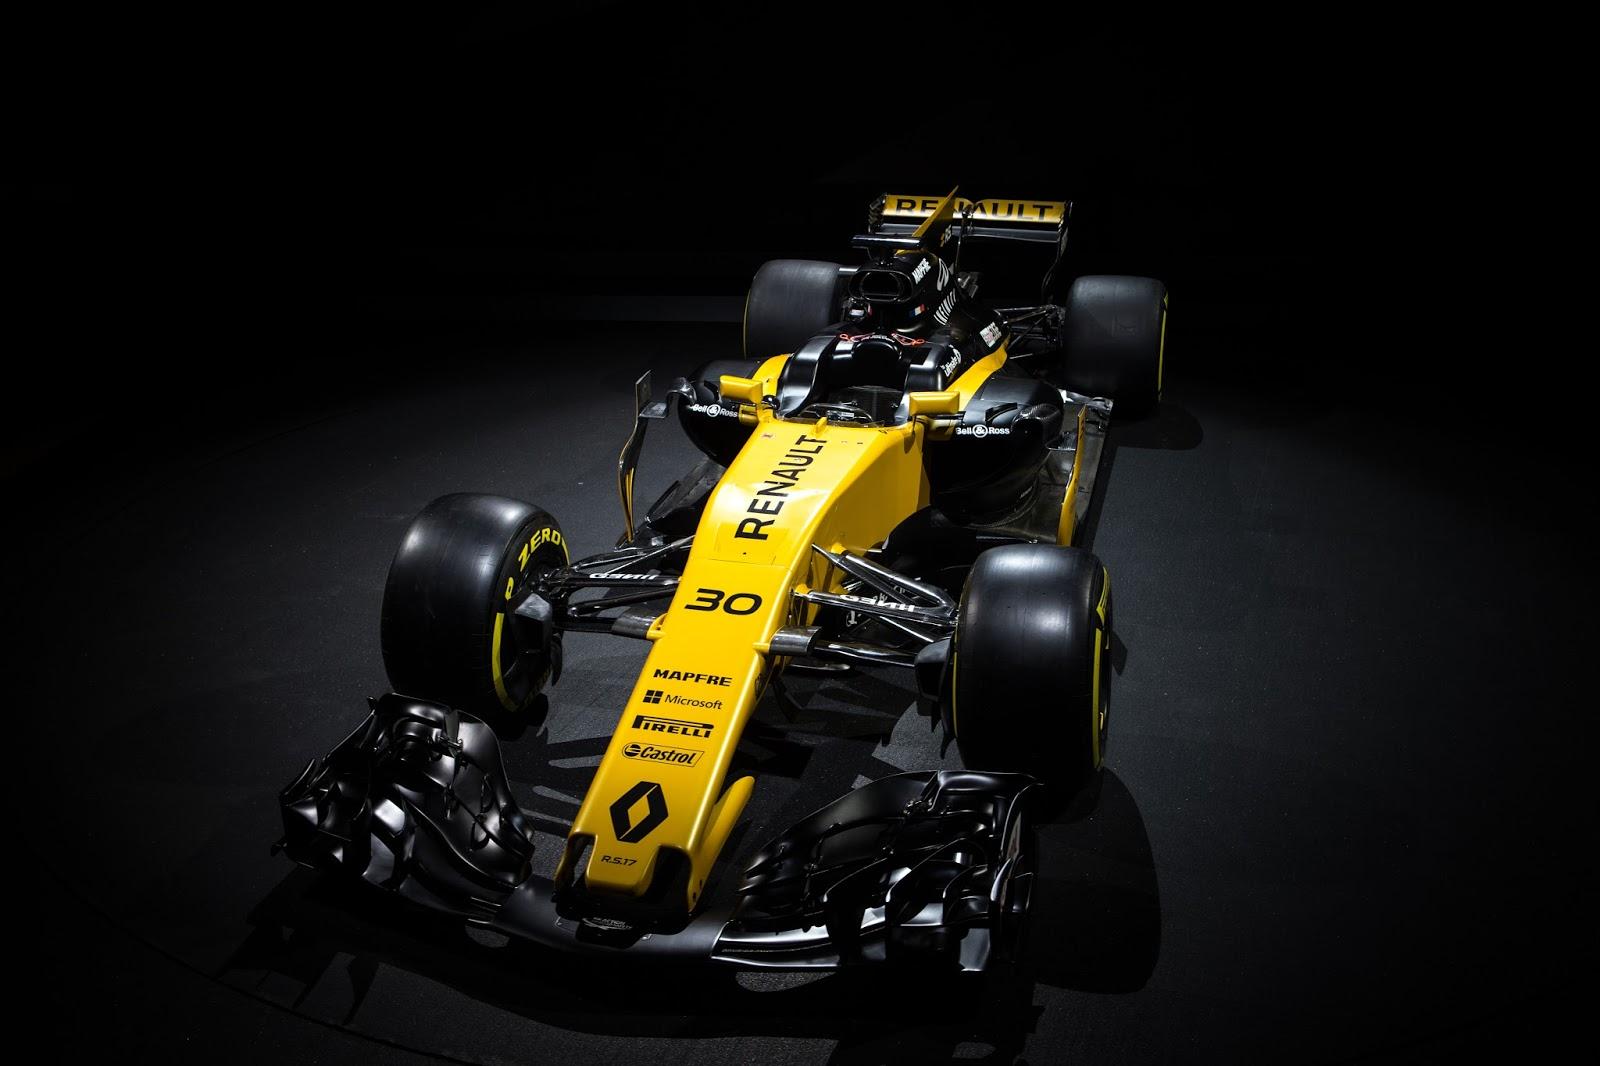 210217 RL 007 1 Η Renault Sport παρουσίασε το καινούργιο της μονοθέσιο, την R.S.17 F1, Formula 1, Renault, Renault Sport Formula 1 Team, videos